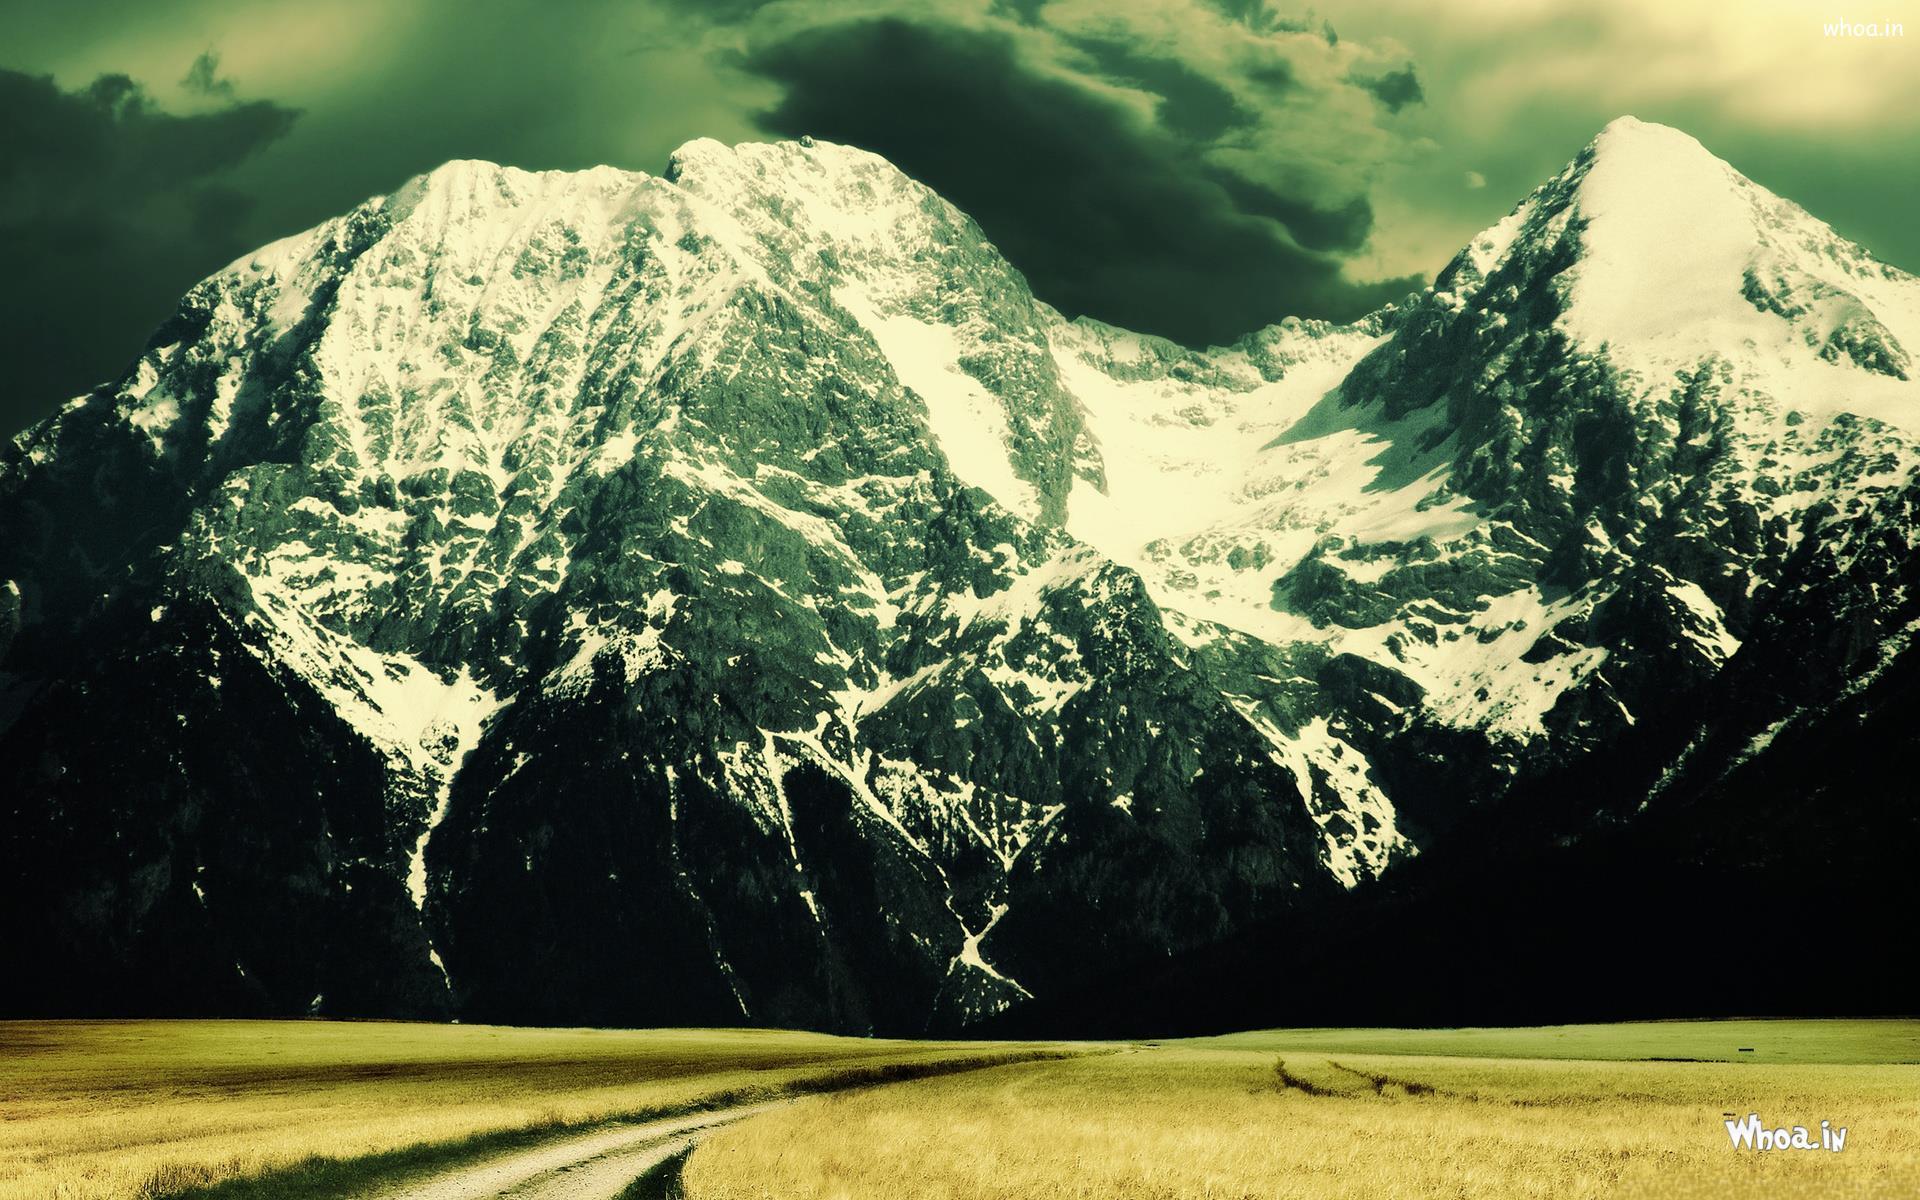 Fantastic Wallpaper Mountain 1080p - natural-snow-mountain-hd-1080p-x-720p-desktop-wallpaper  2018_297261.in/download/natural-snow-mountain-hd-1080p-x-720p-desktop-wallpaper